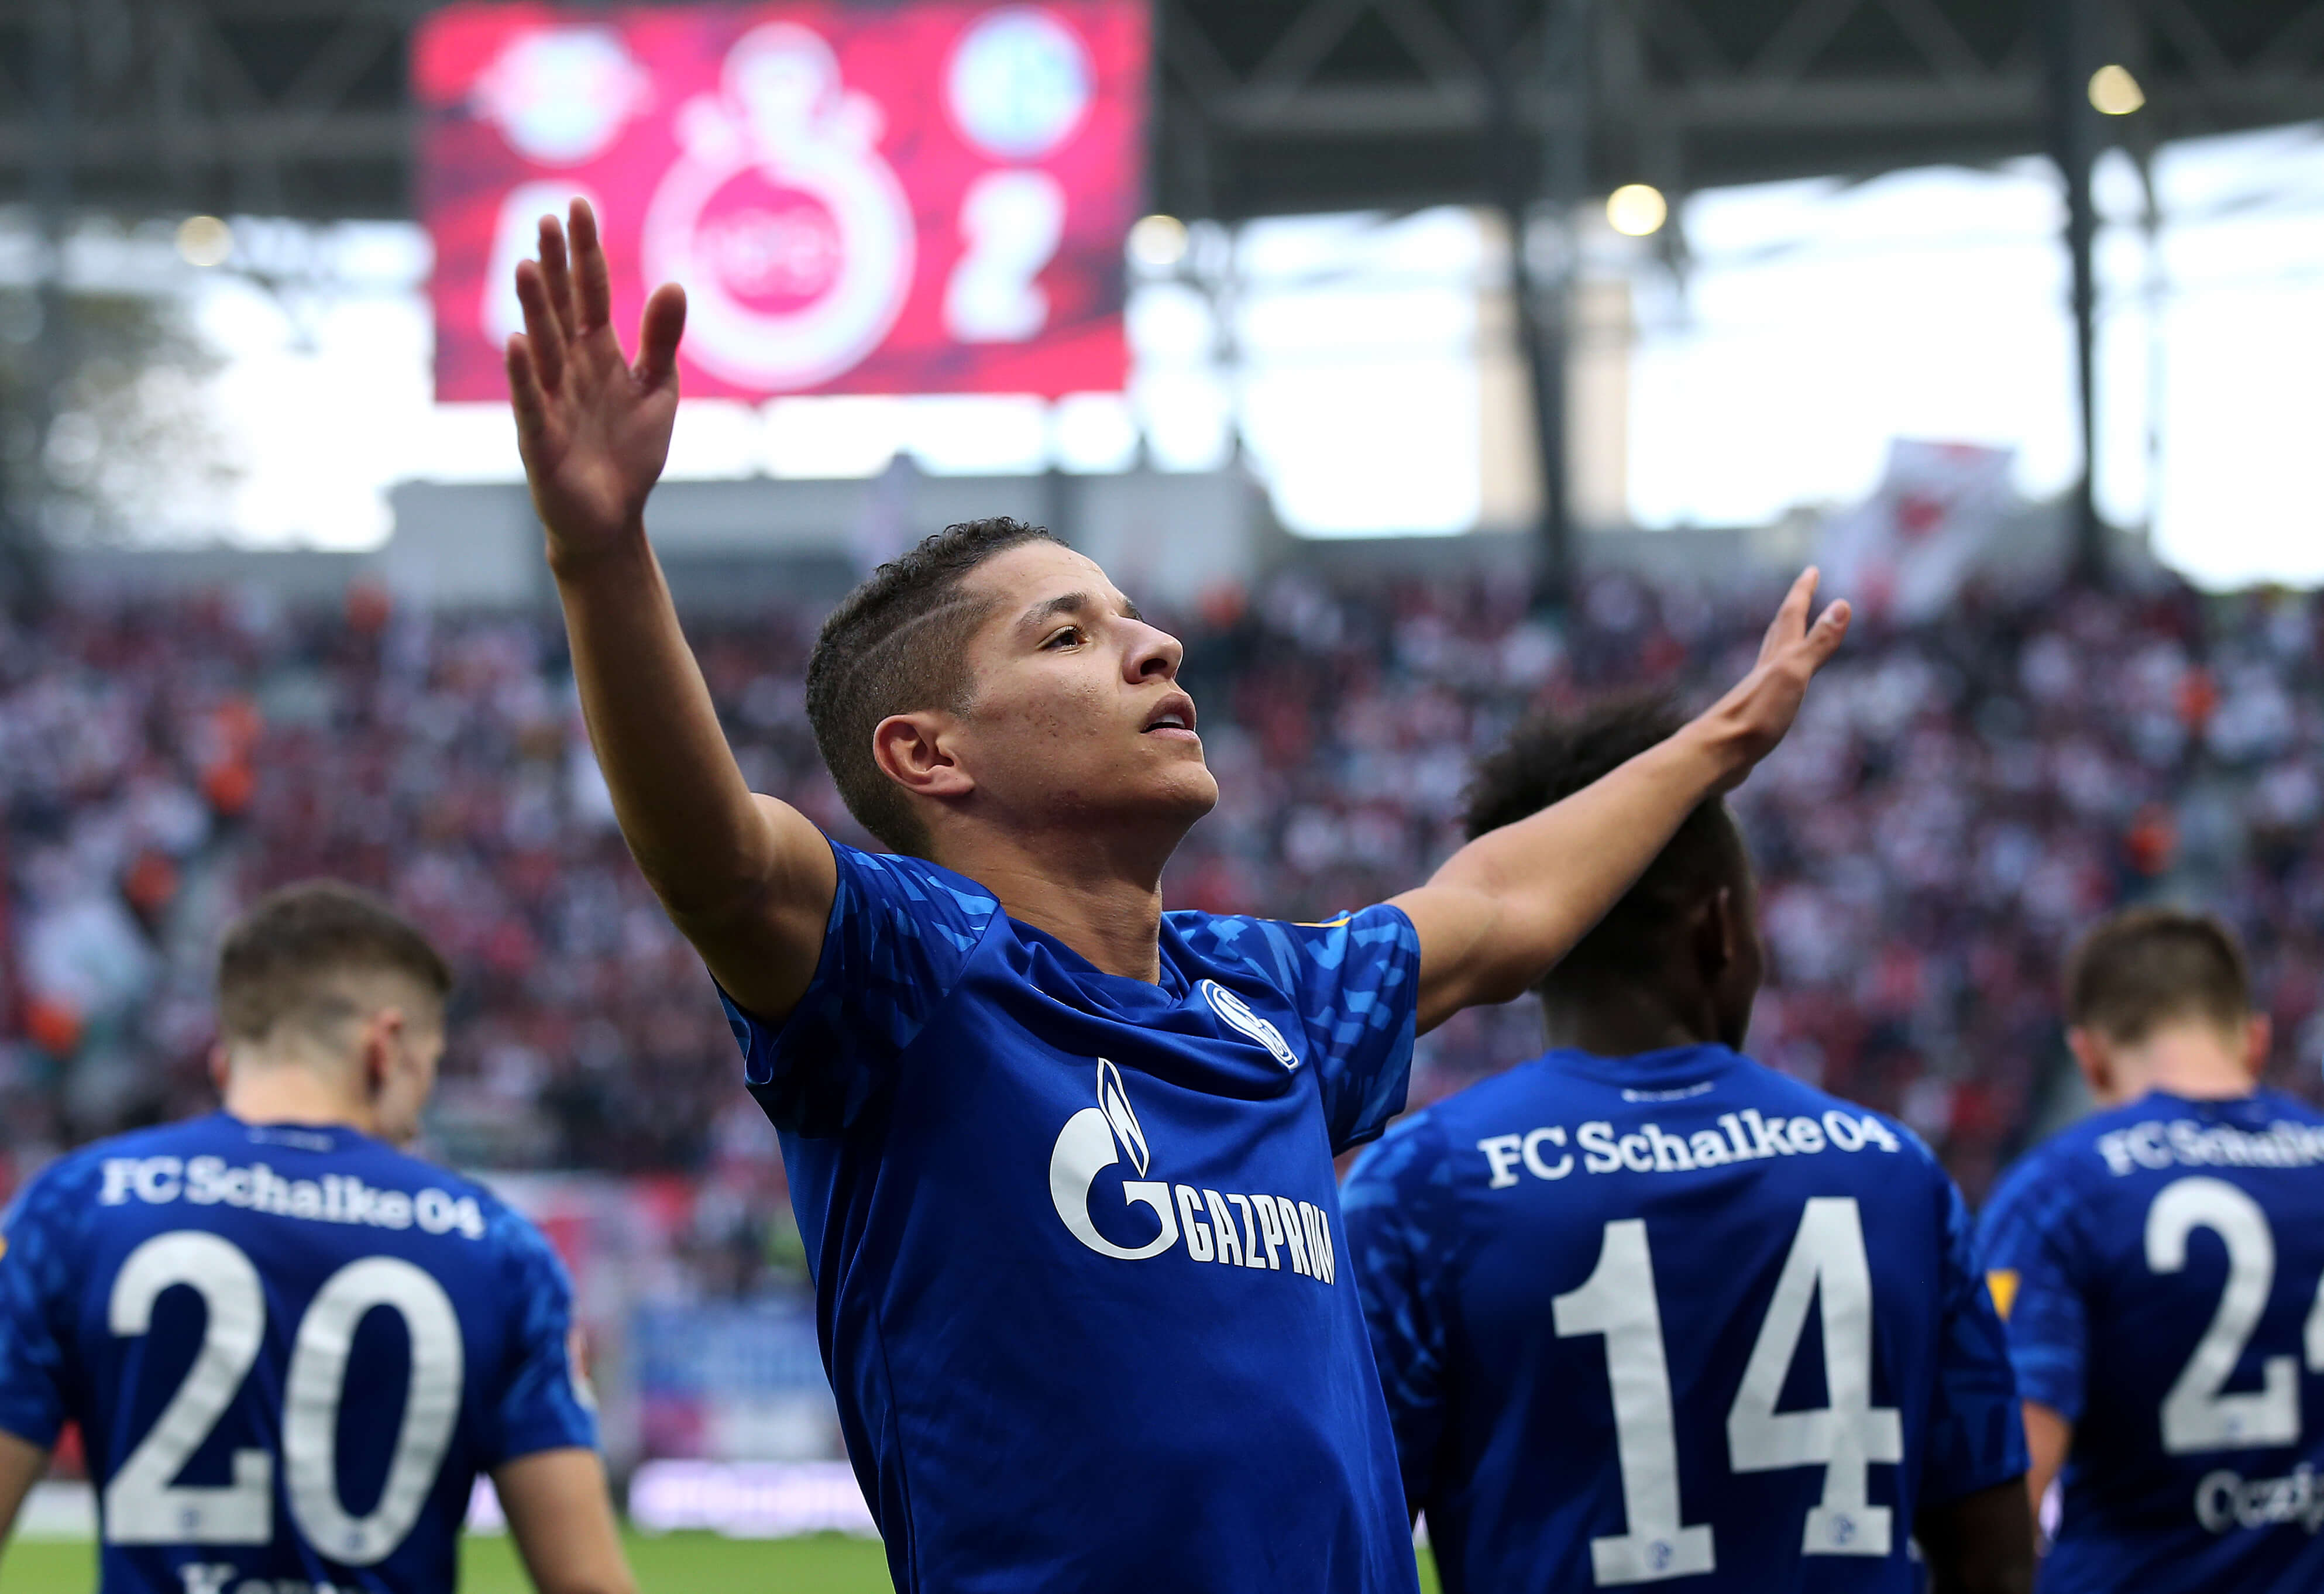 Amine Harit Schalke04 celebrate